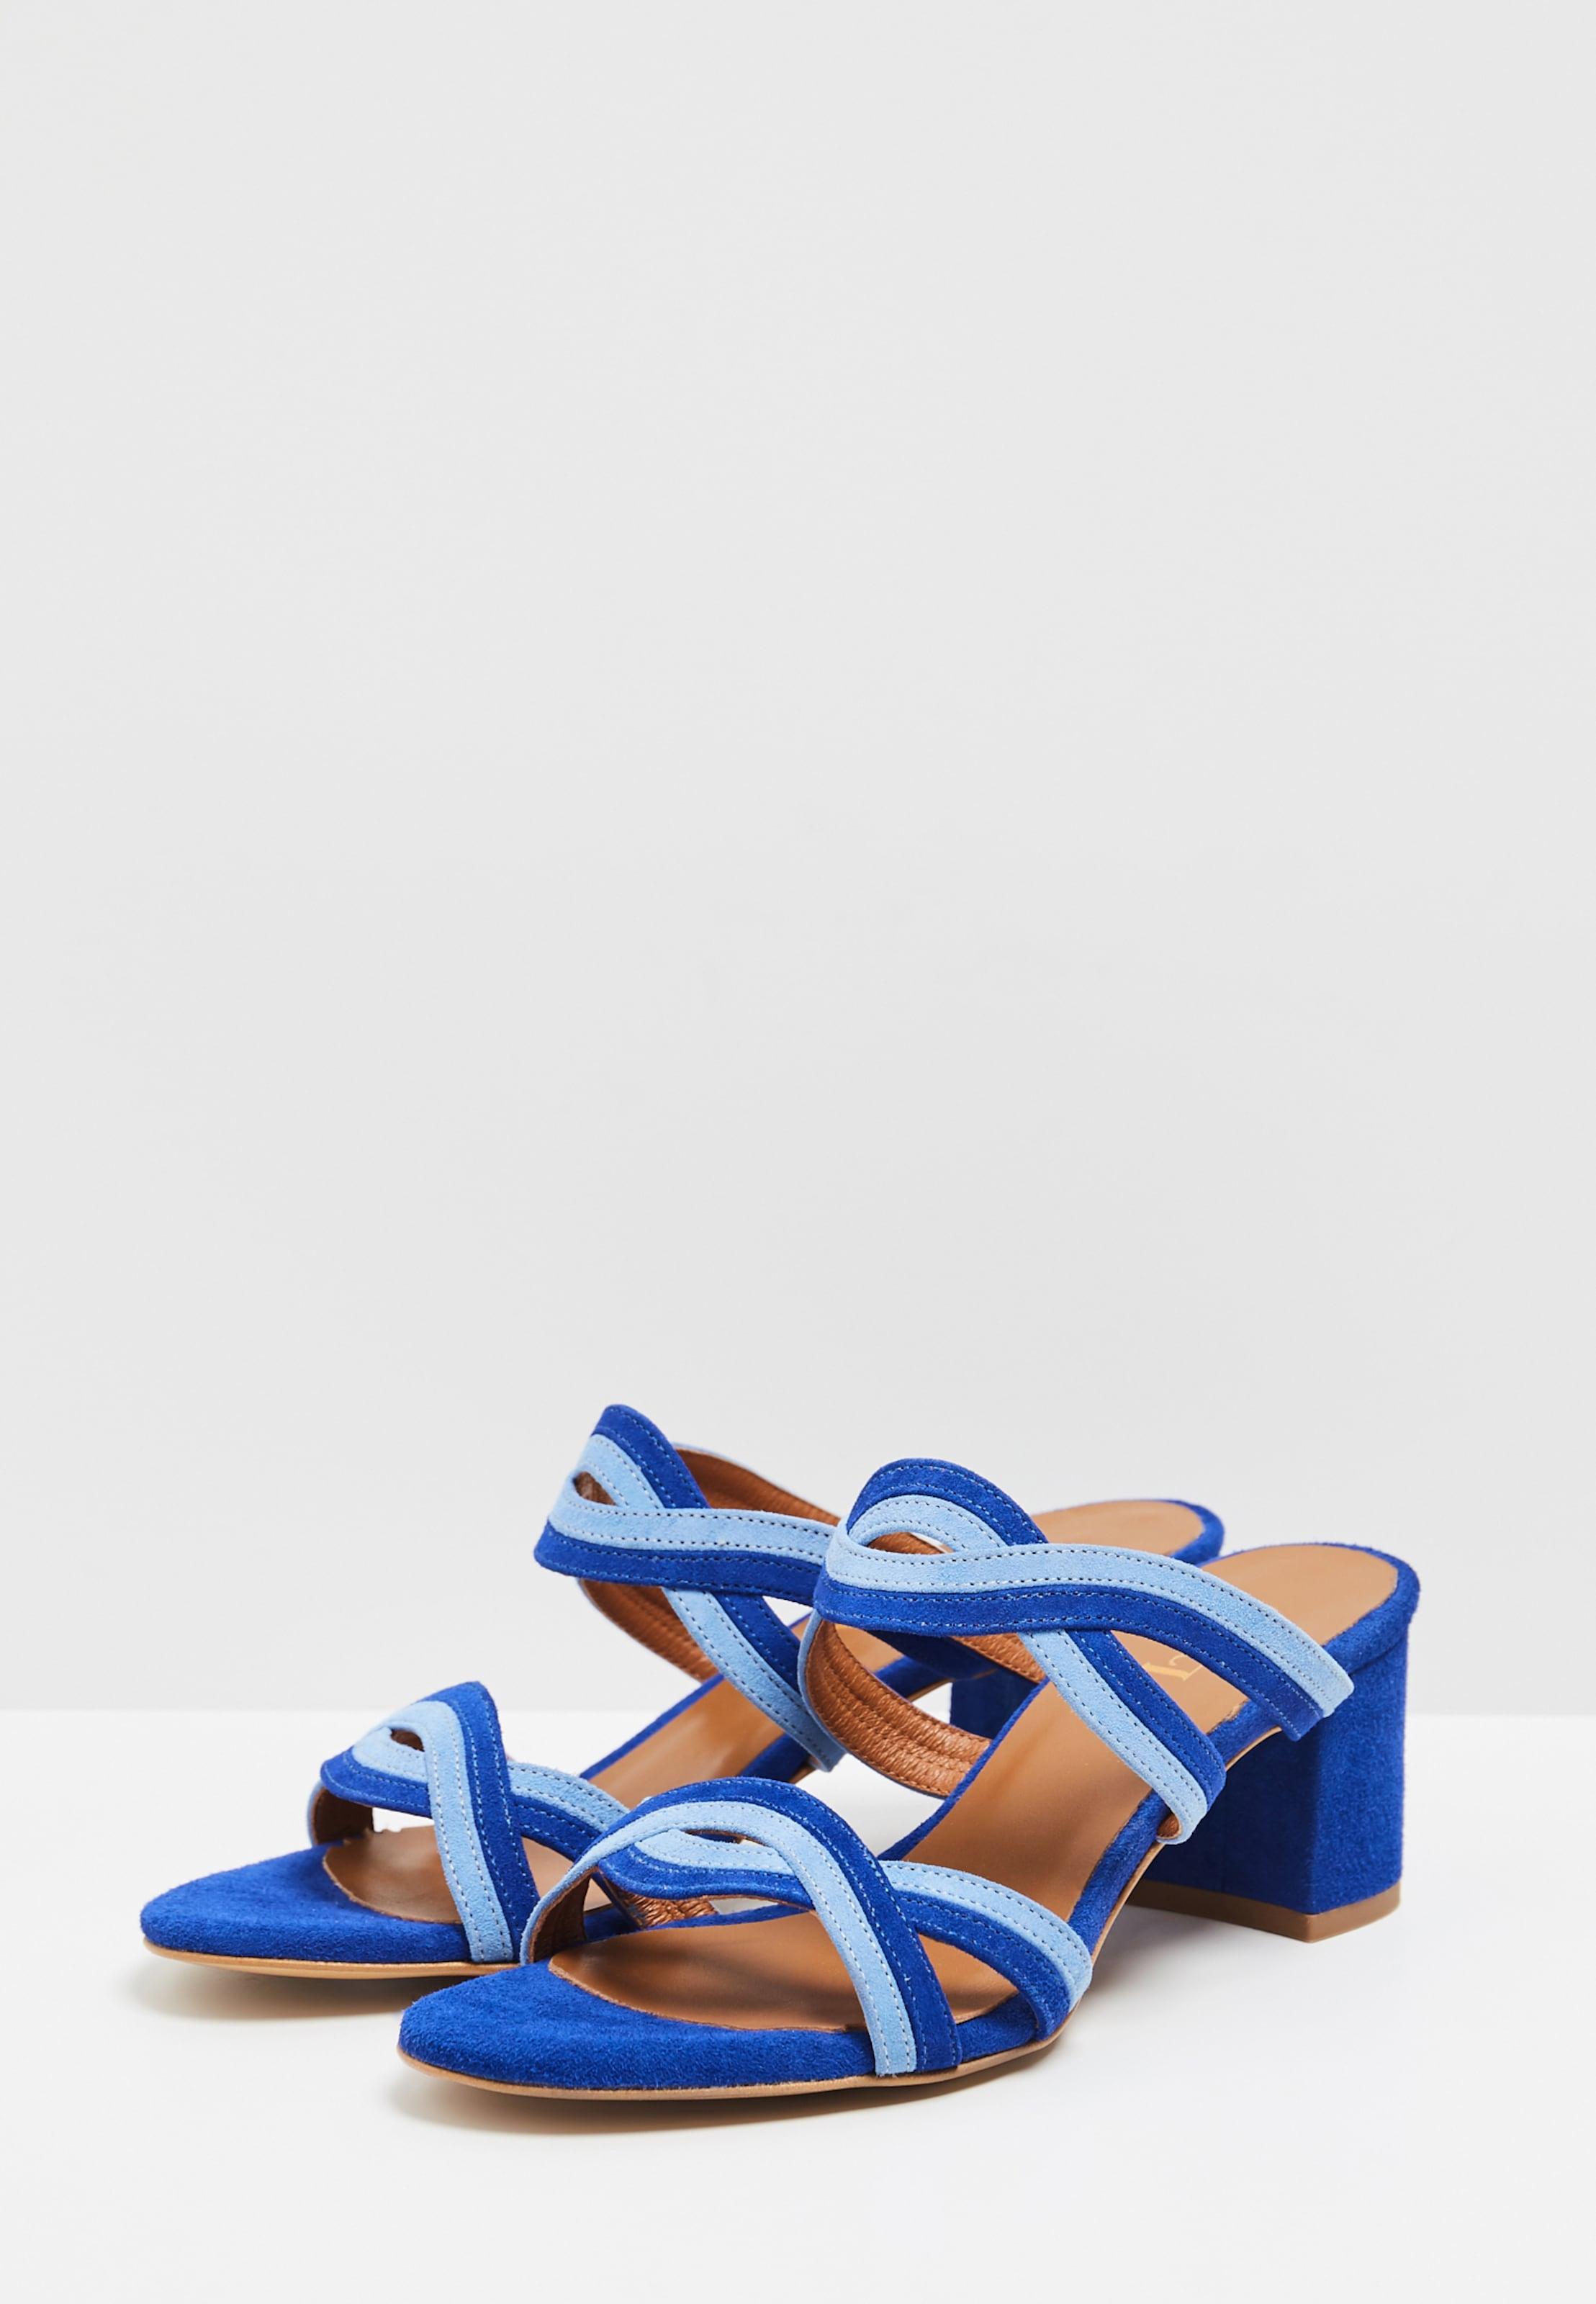 BlauHellblau In Izia In Sandale Sandale Izia In BlauHellblau Sandale Izia OPkuTiZX